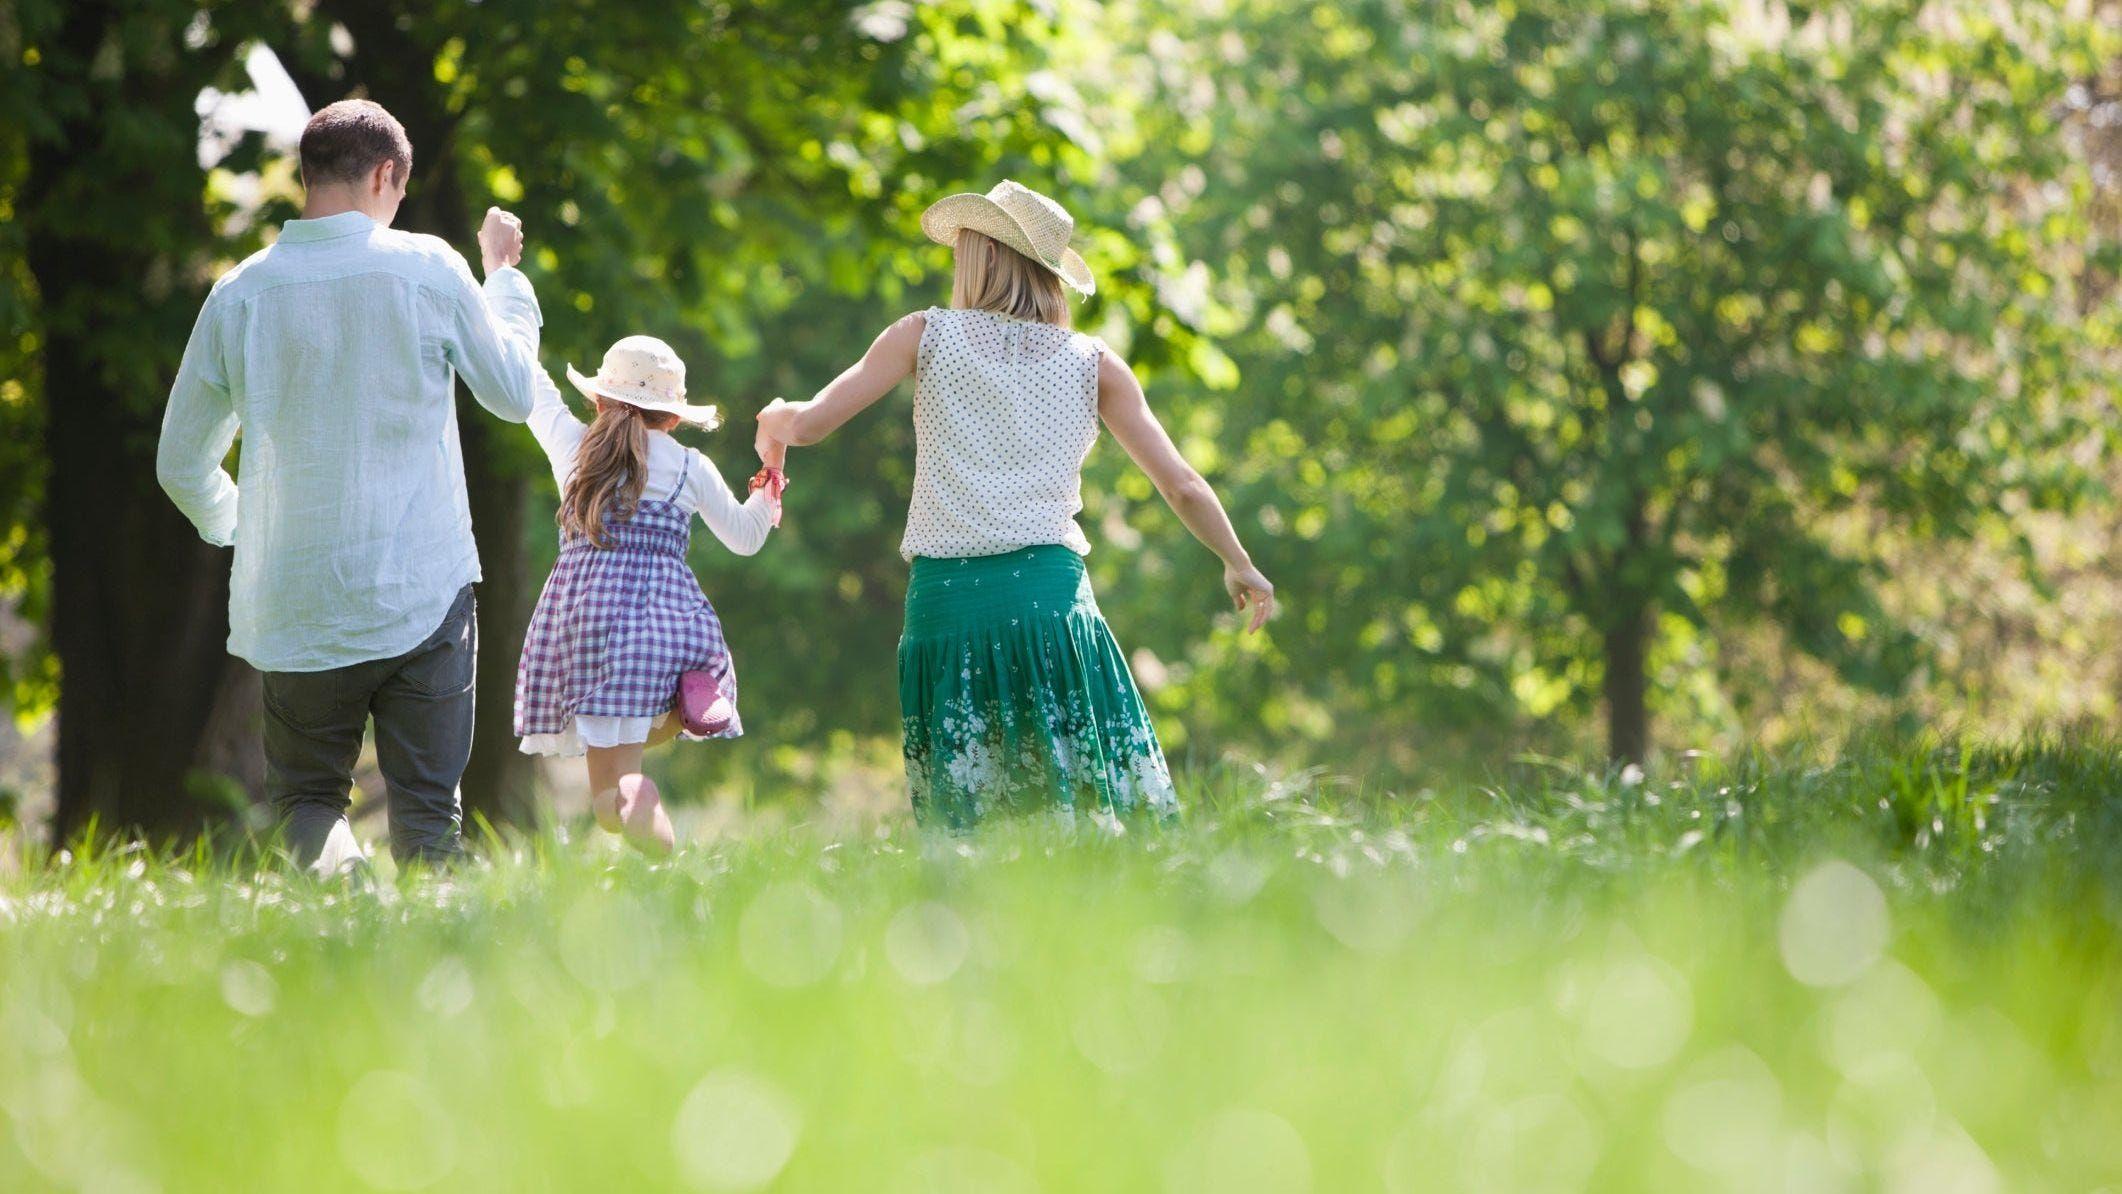 Here S What To Do If You Re In Your 40s With No Retirement